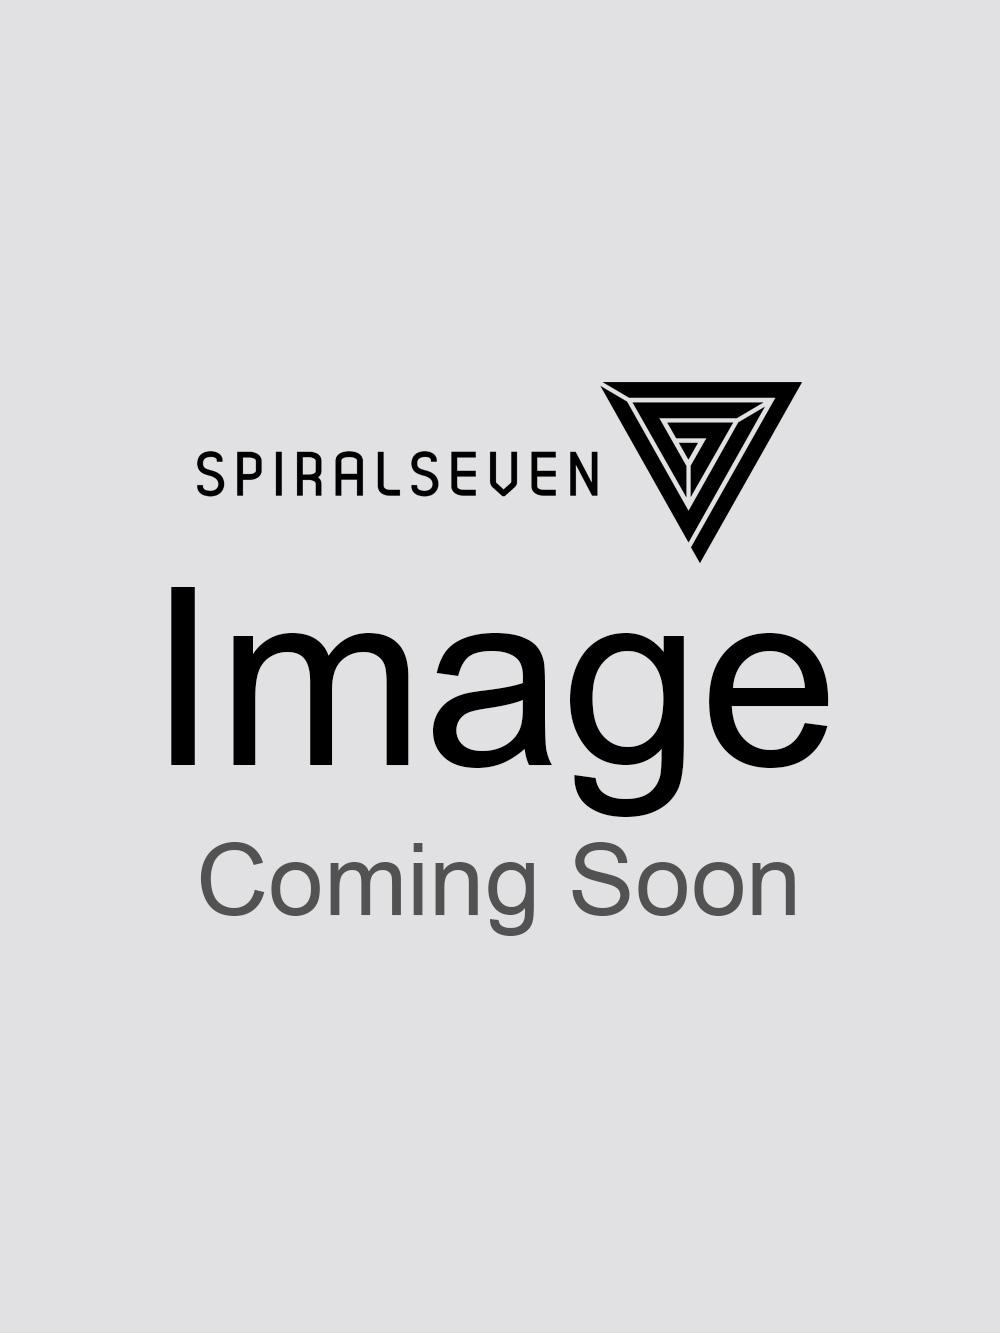 ed84e0acc6 Fila Vintage Peter Colour Block Shorts Directoire Blue | Spiral Seven -  Designer Clothing